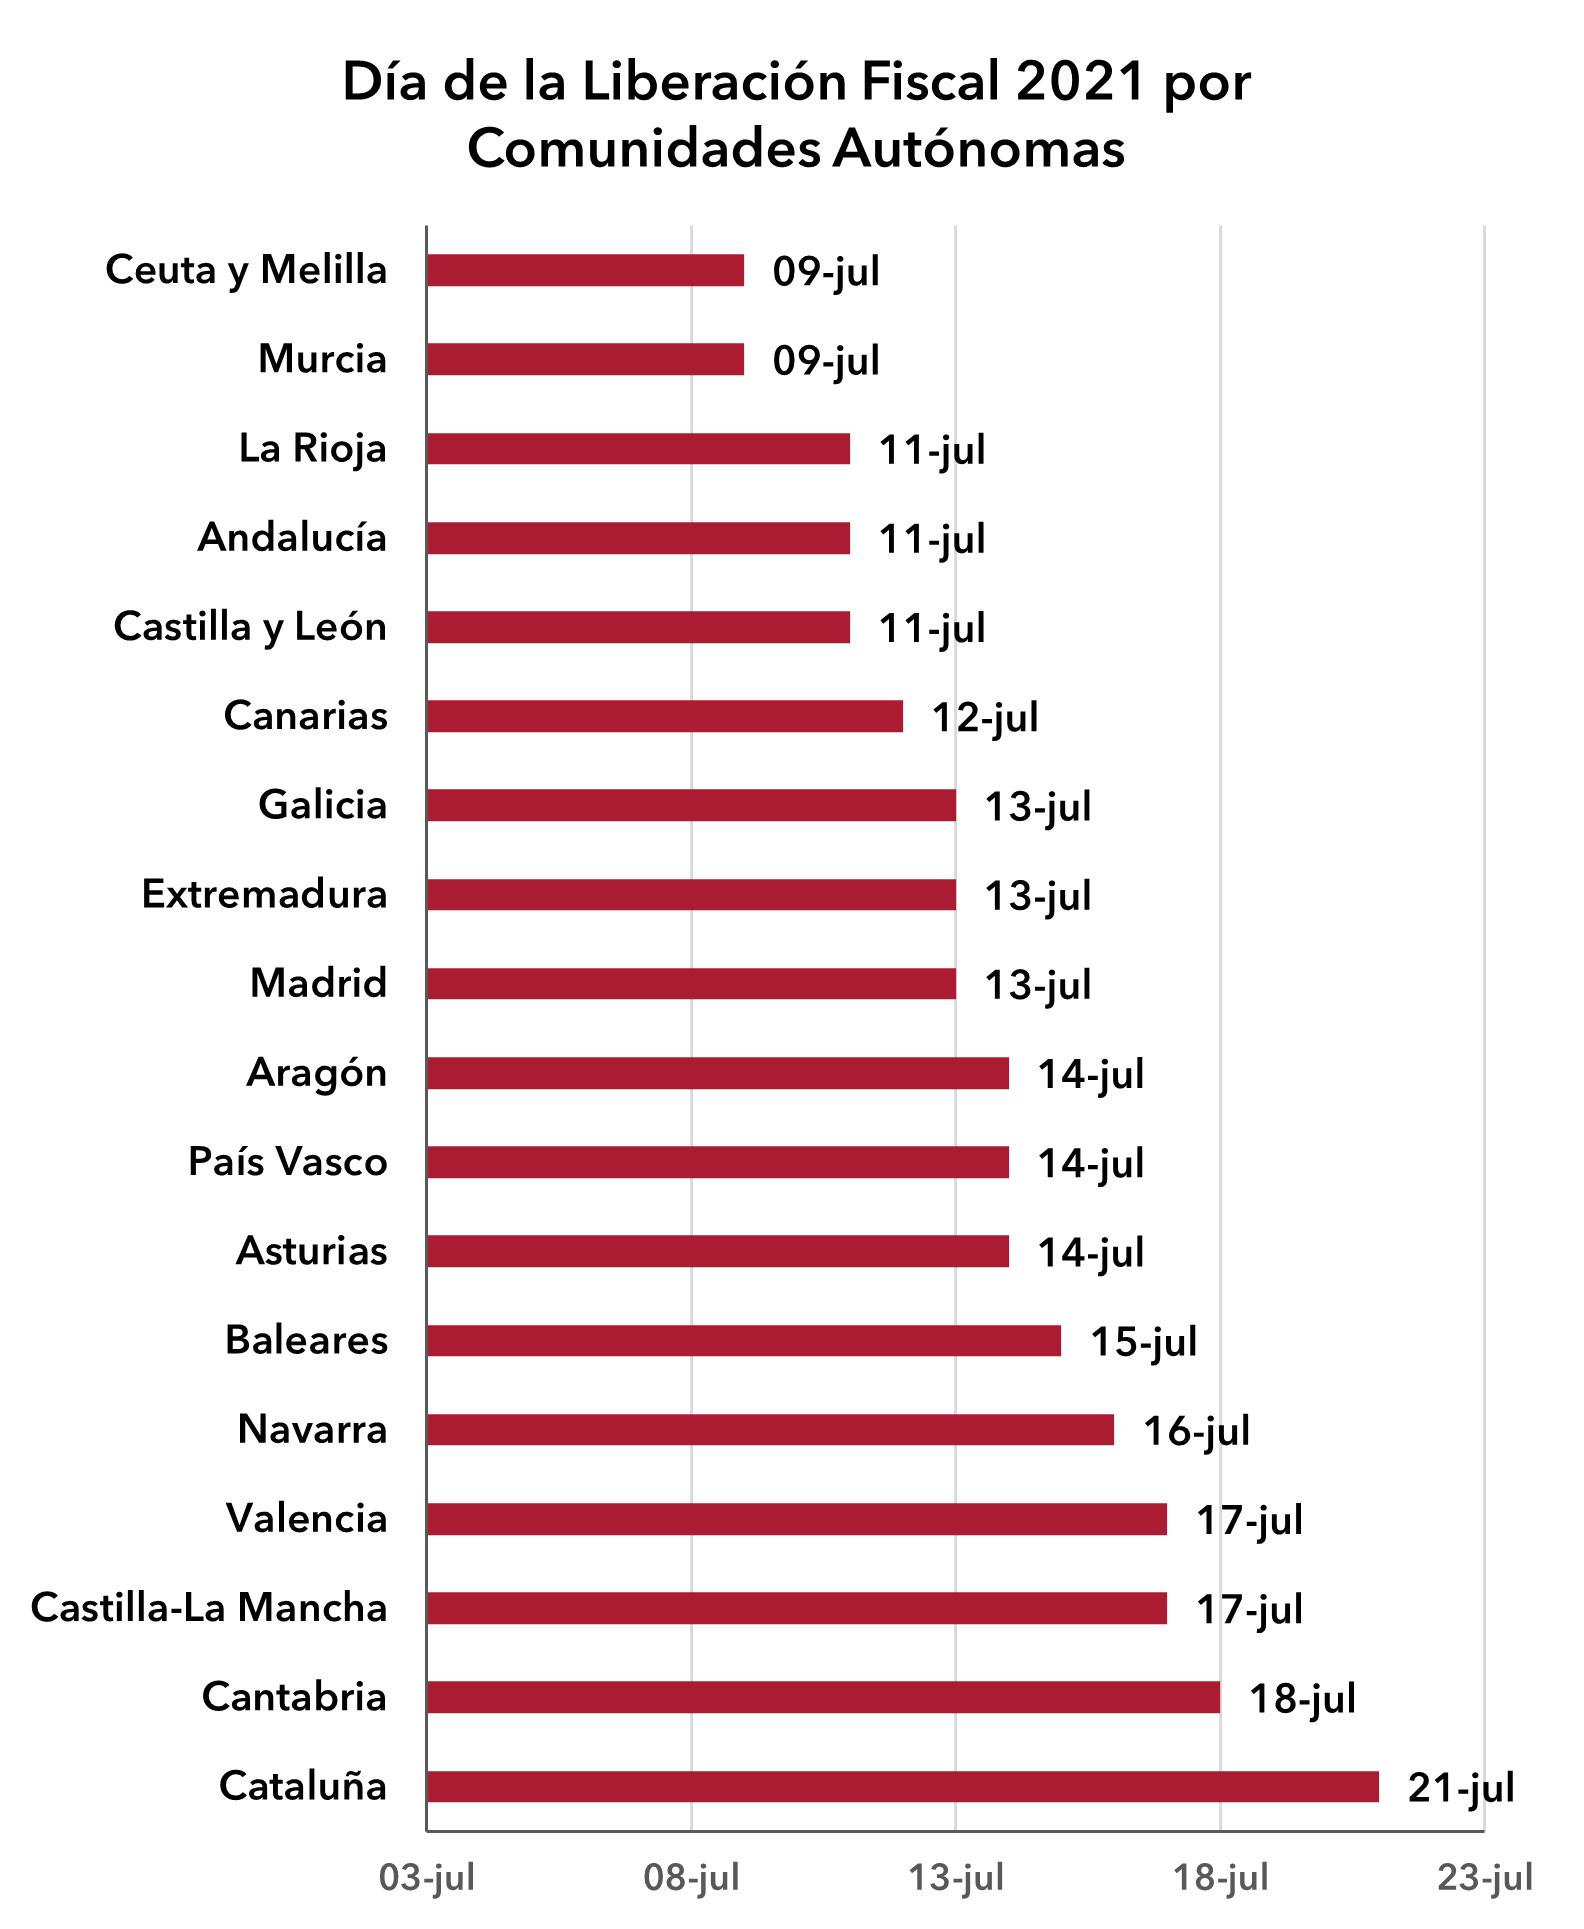 dlf-2021-comunidades.png